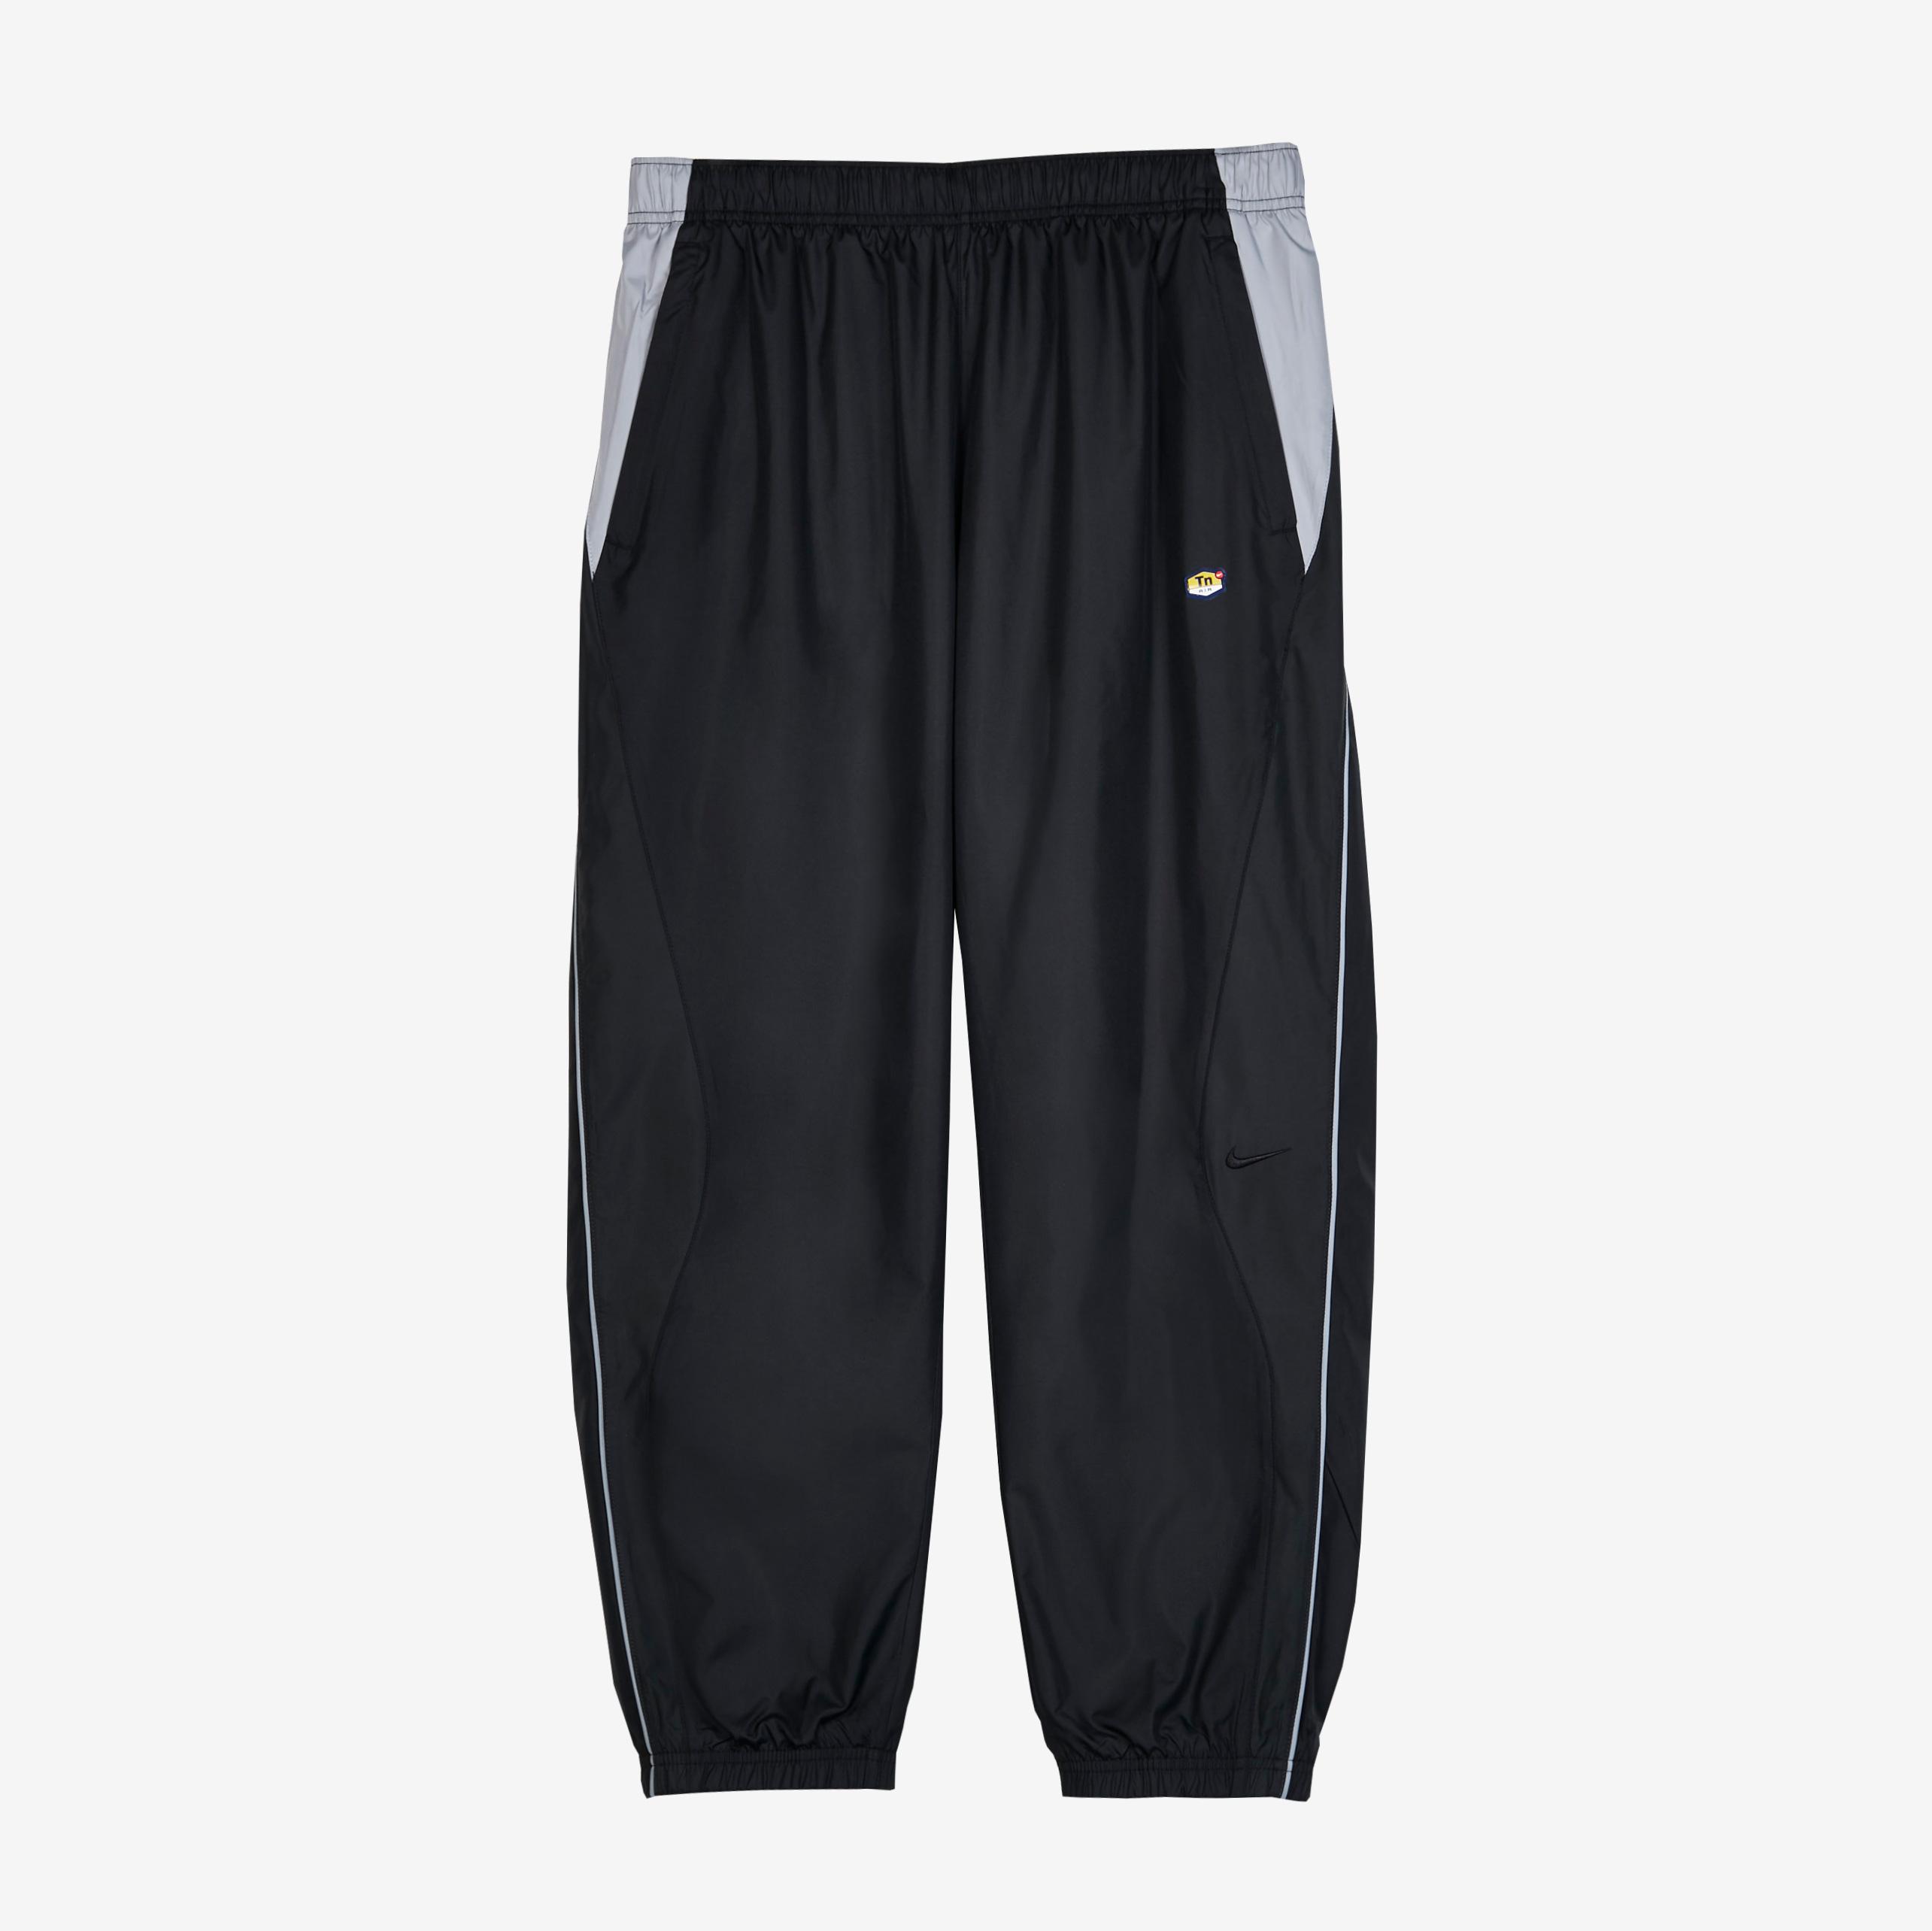 3855e20d2d7f2 Nike Tn Track Pant - Ar5858-010 - Sneakersnstuff